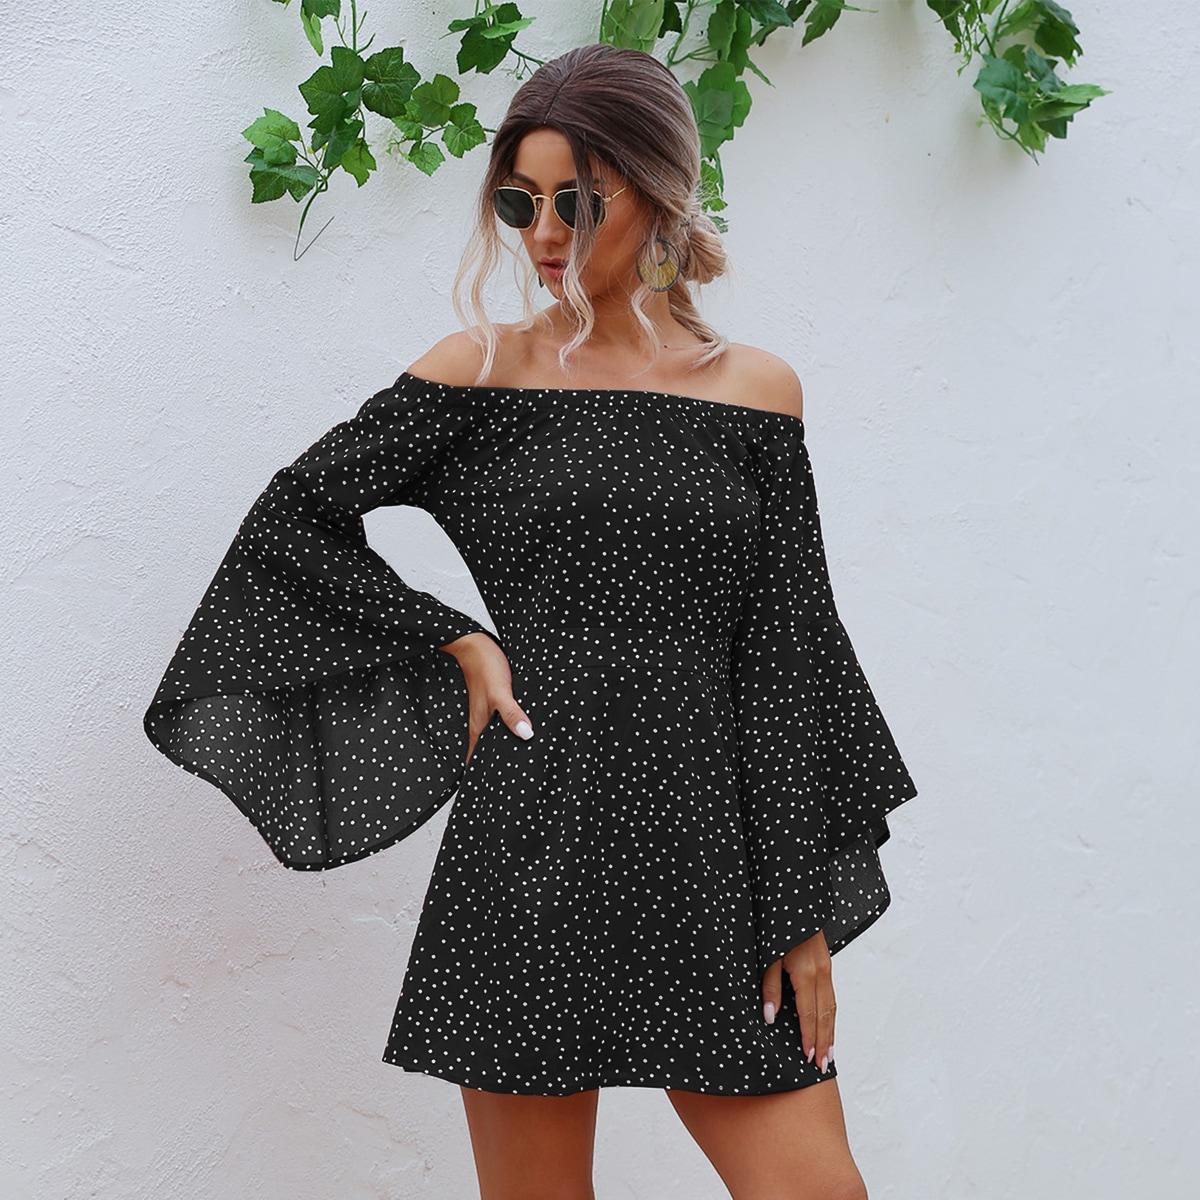 SHEIN / Polka Dot Bardot Flounce Sleeve Dress